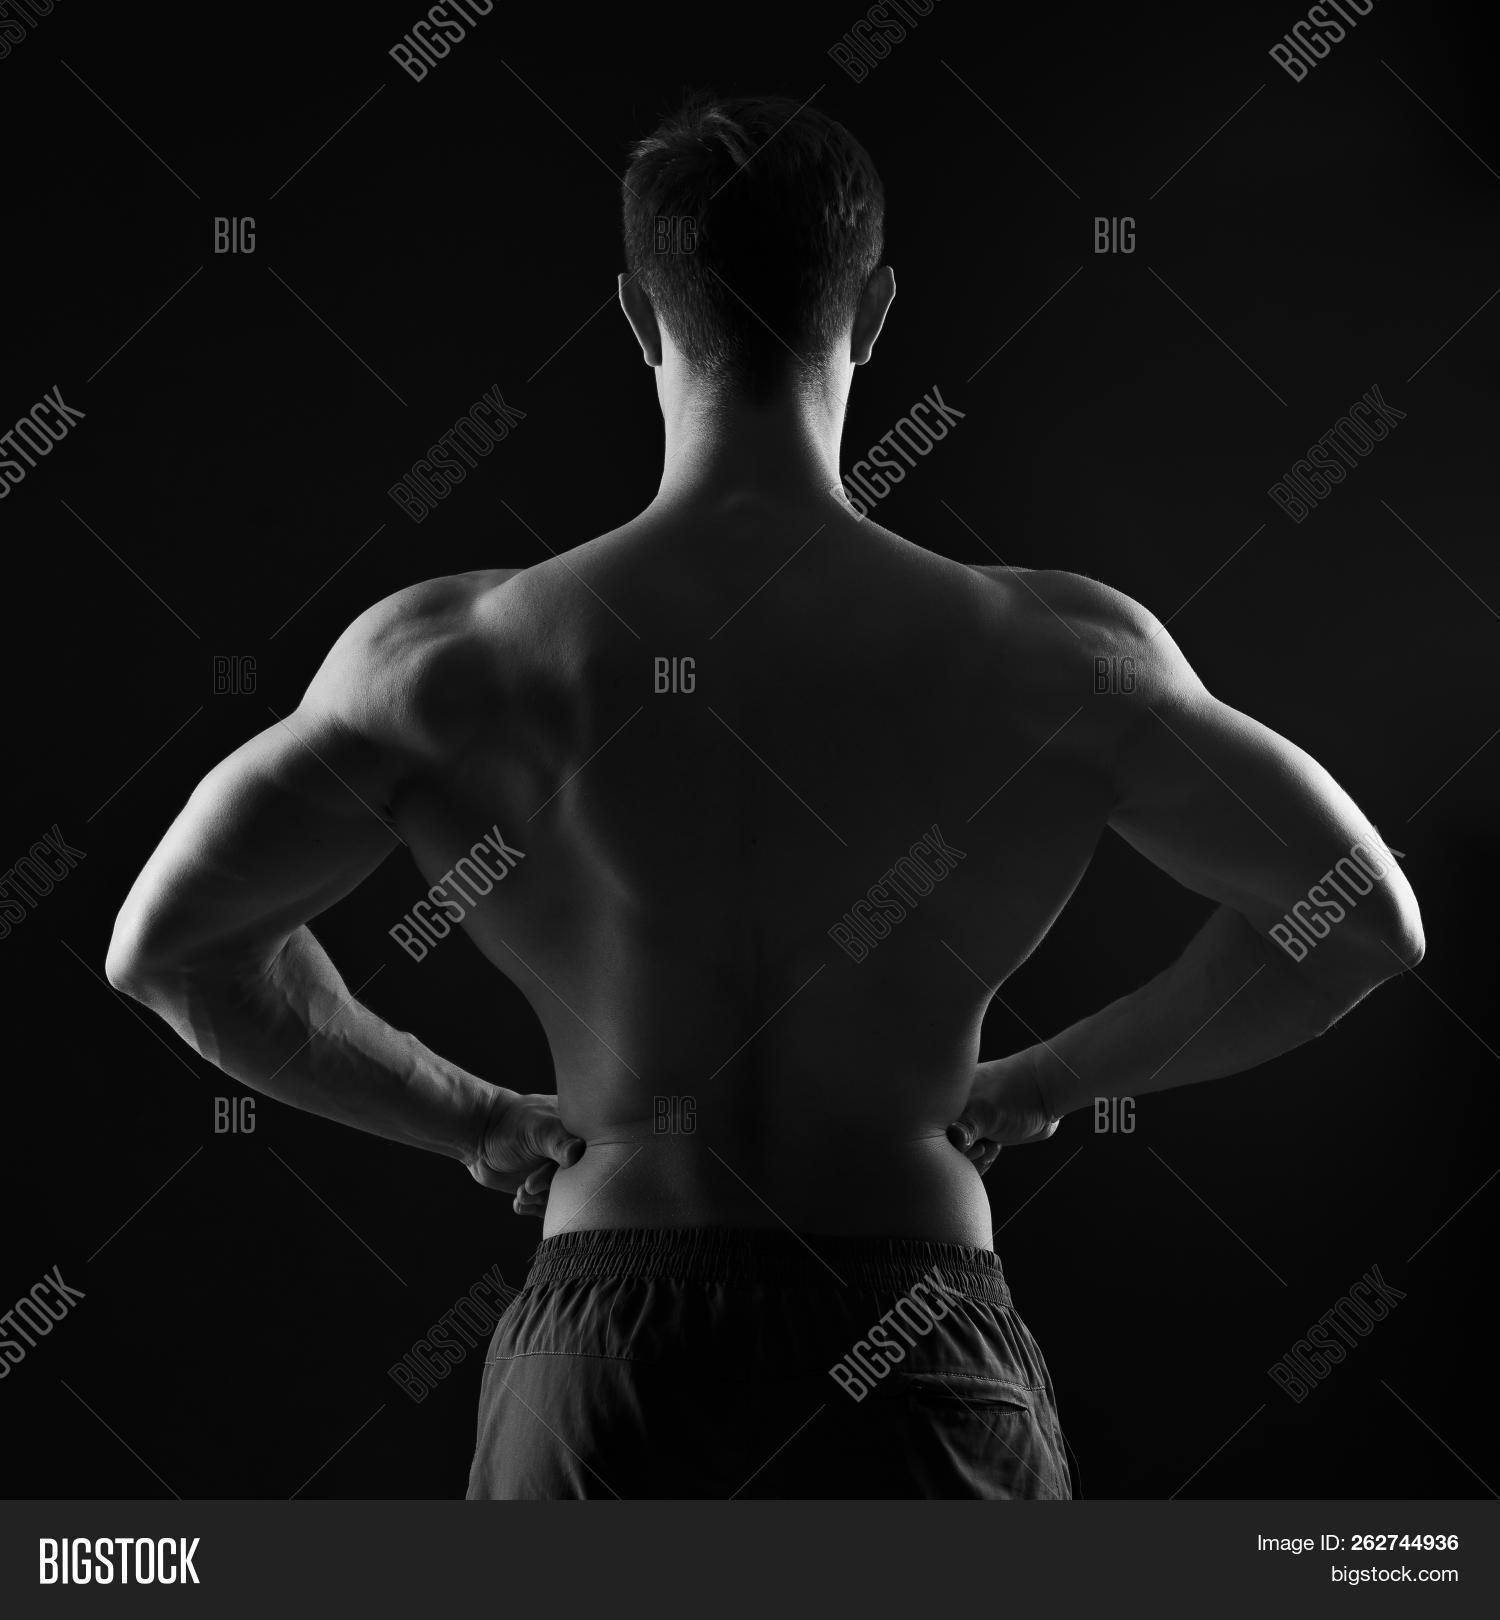 Big Back Athlete Background For Sports Black And White Photography 262744936 Image Stock Photo